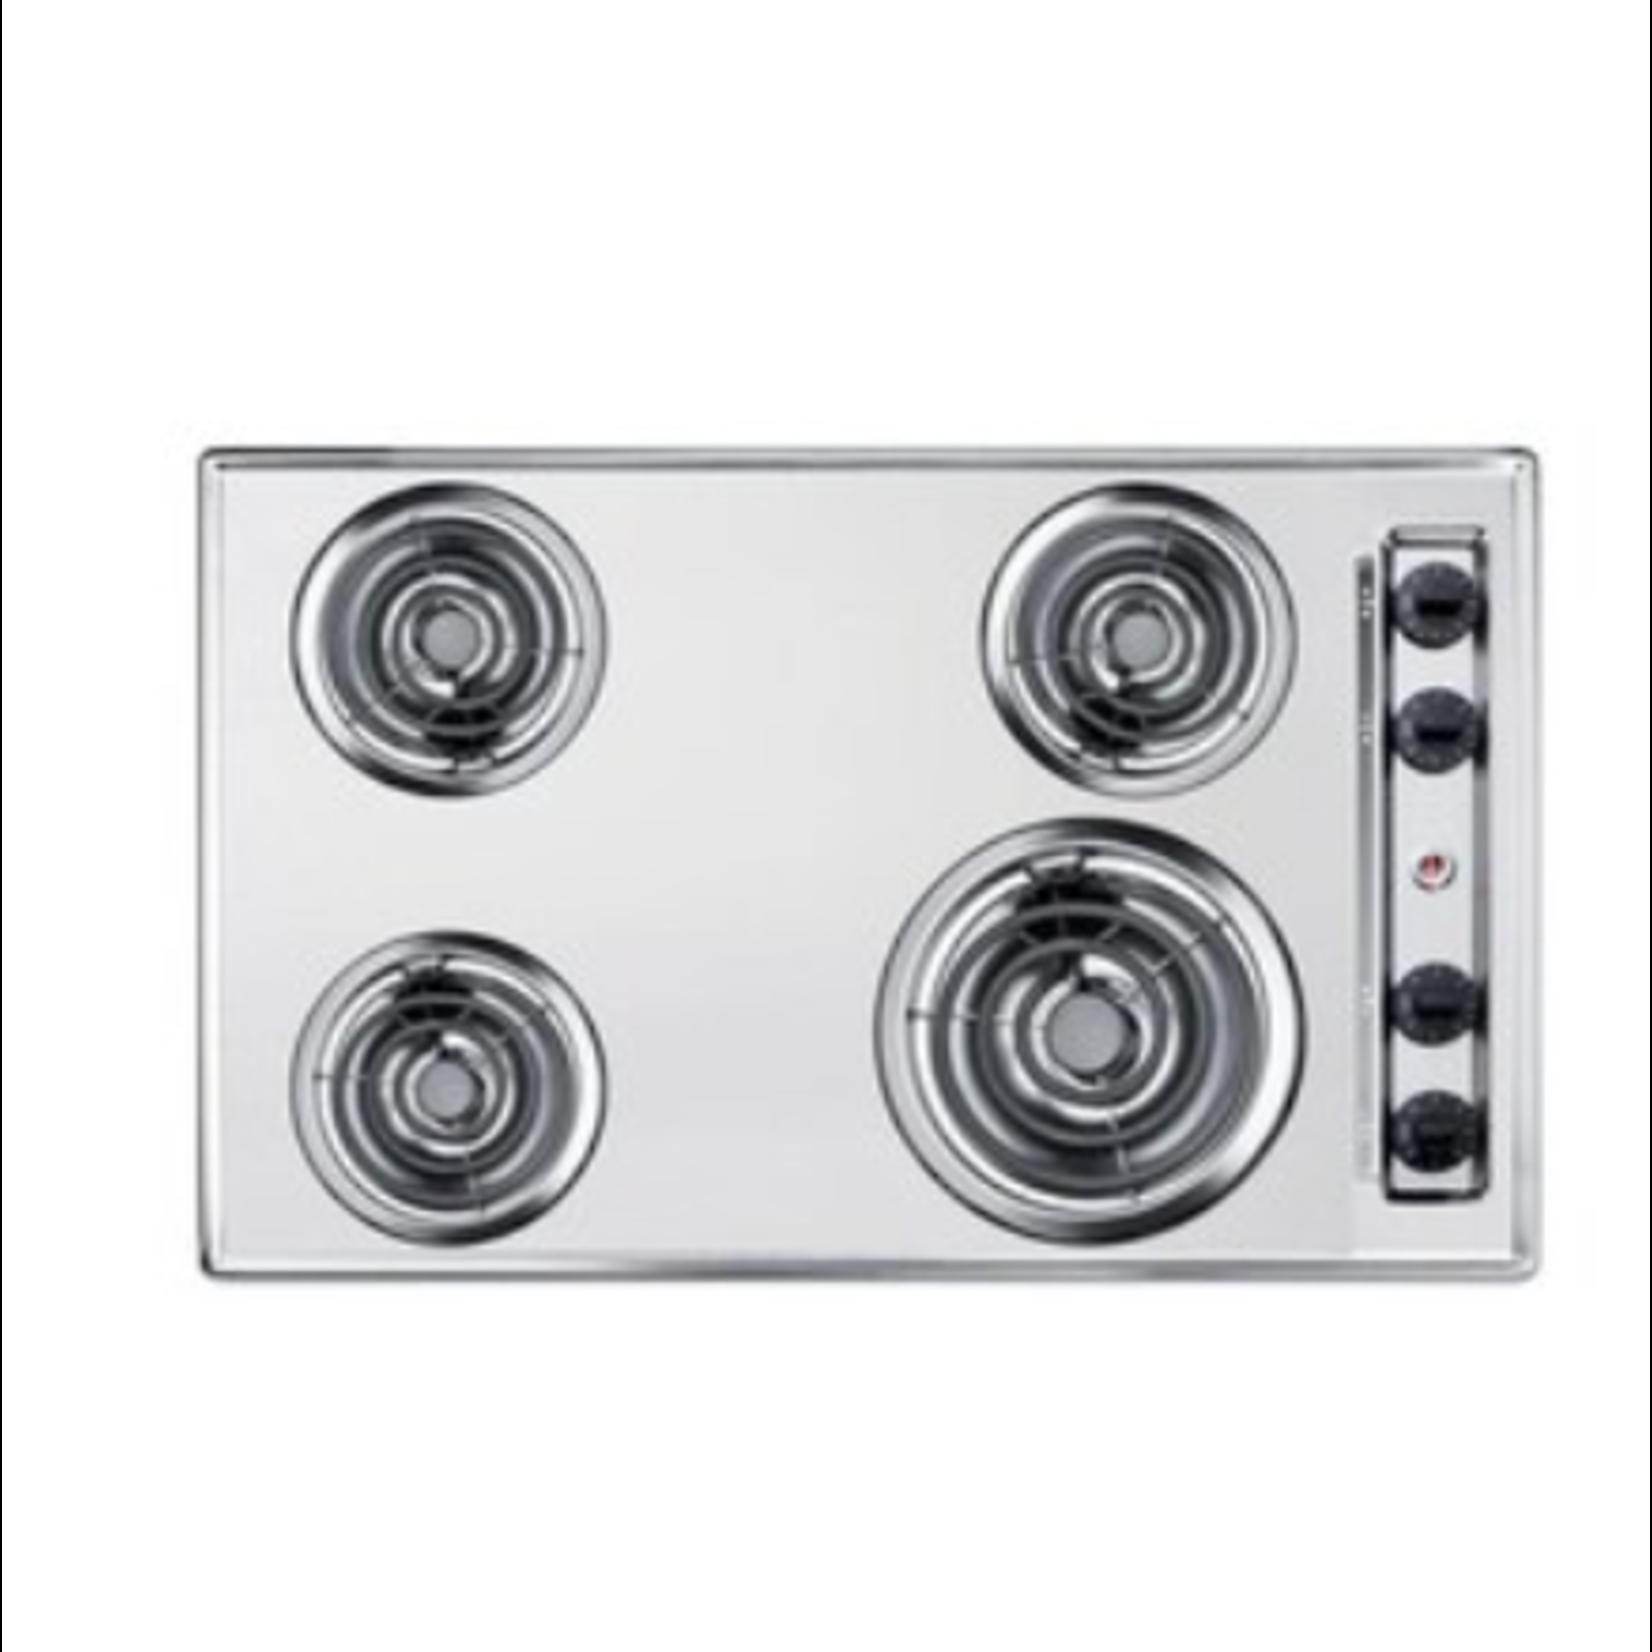 "10519 Summit Appliance 30"" Metallic Cooktop"